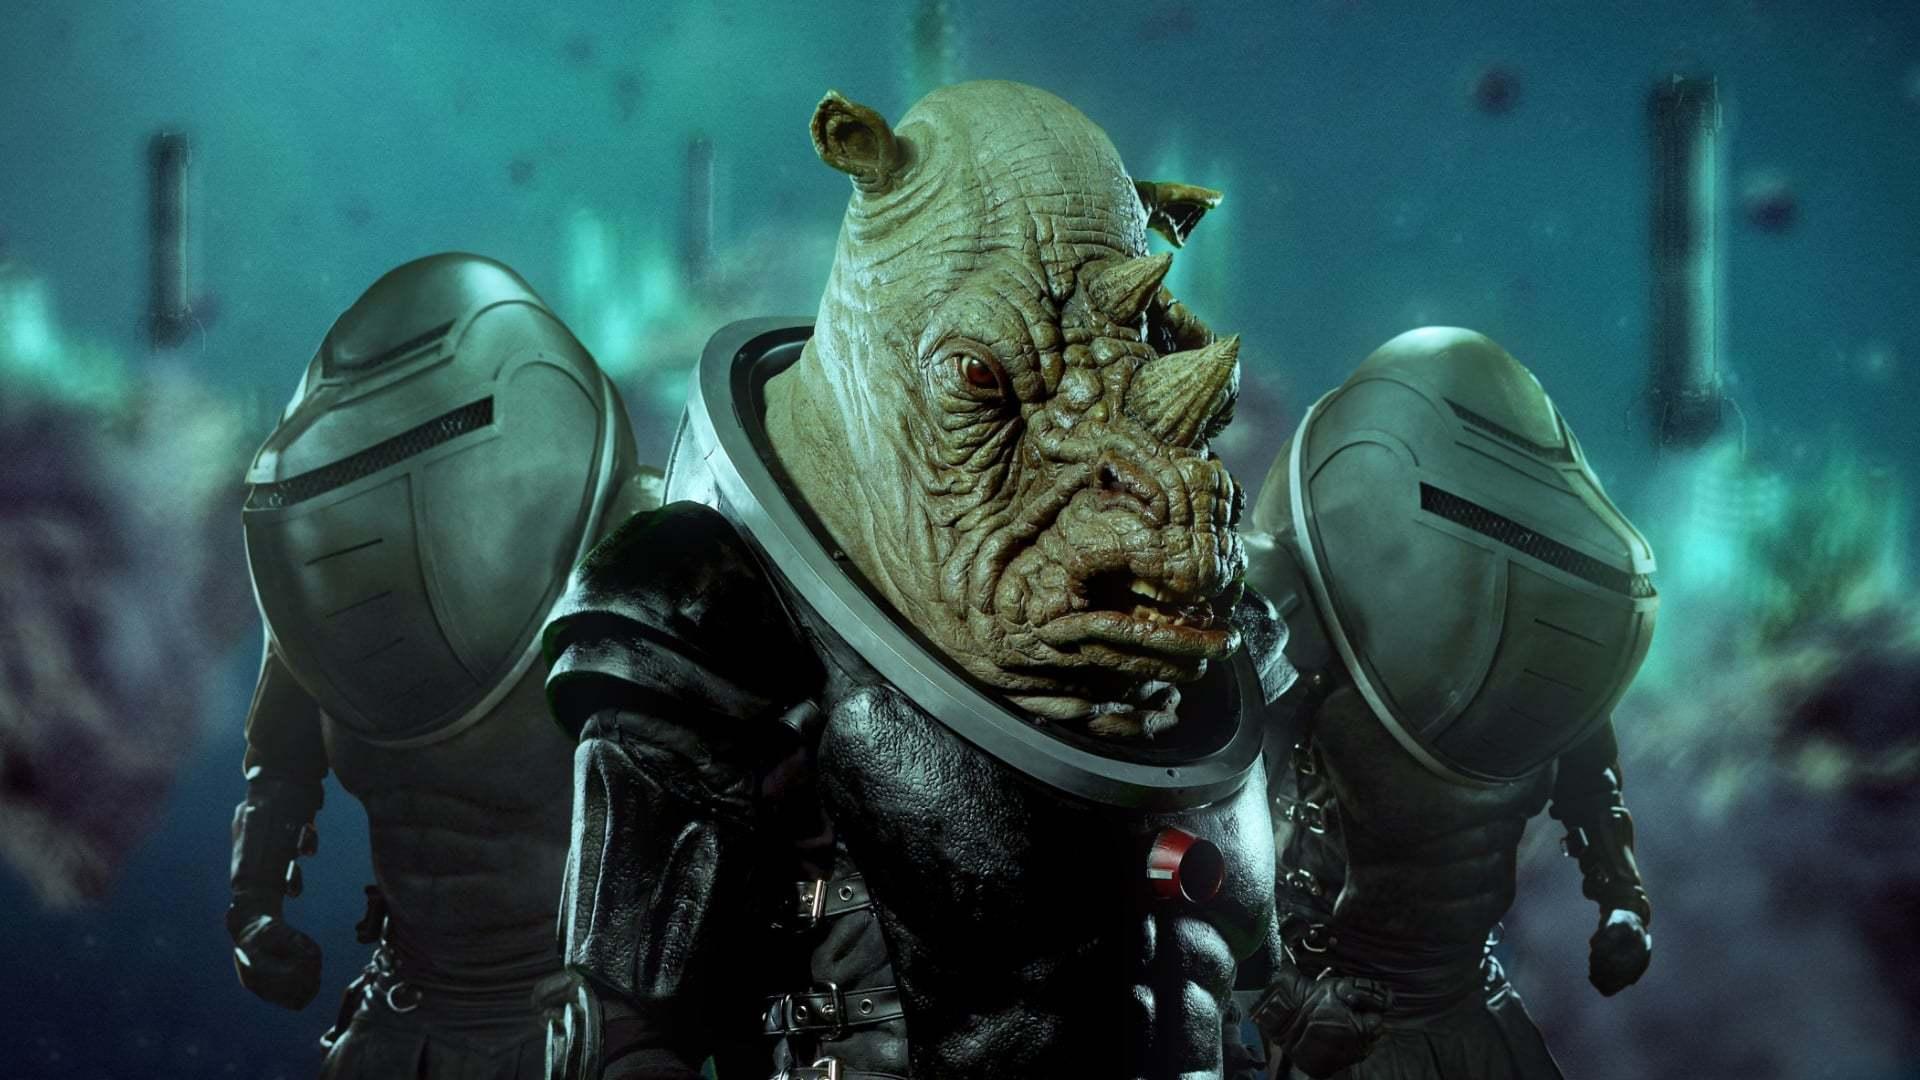 Кадры из фильма Доктор Кто Doctor Who 2005